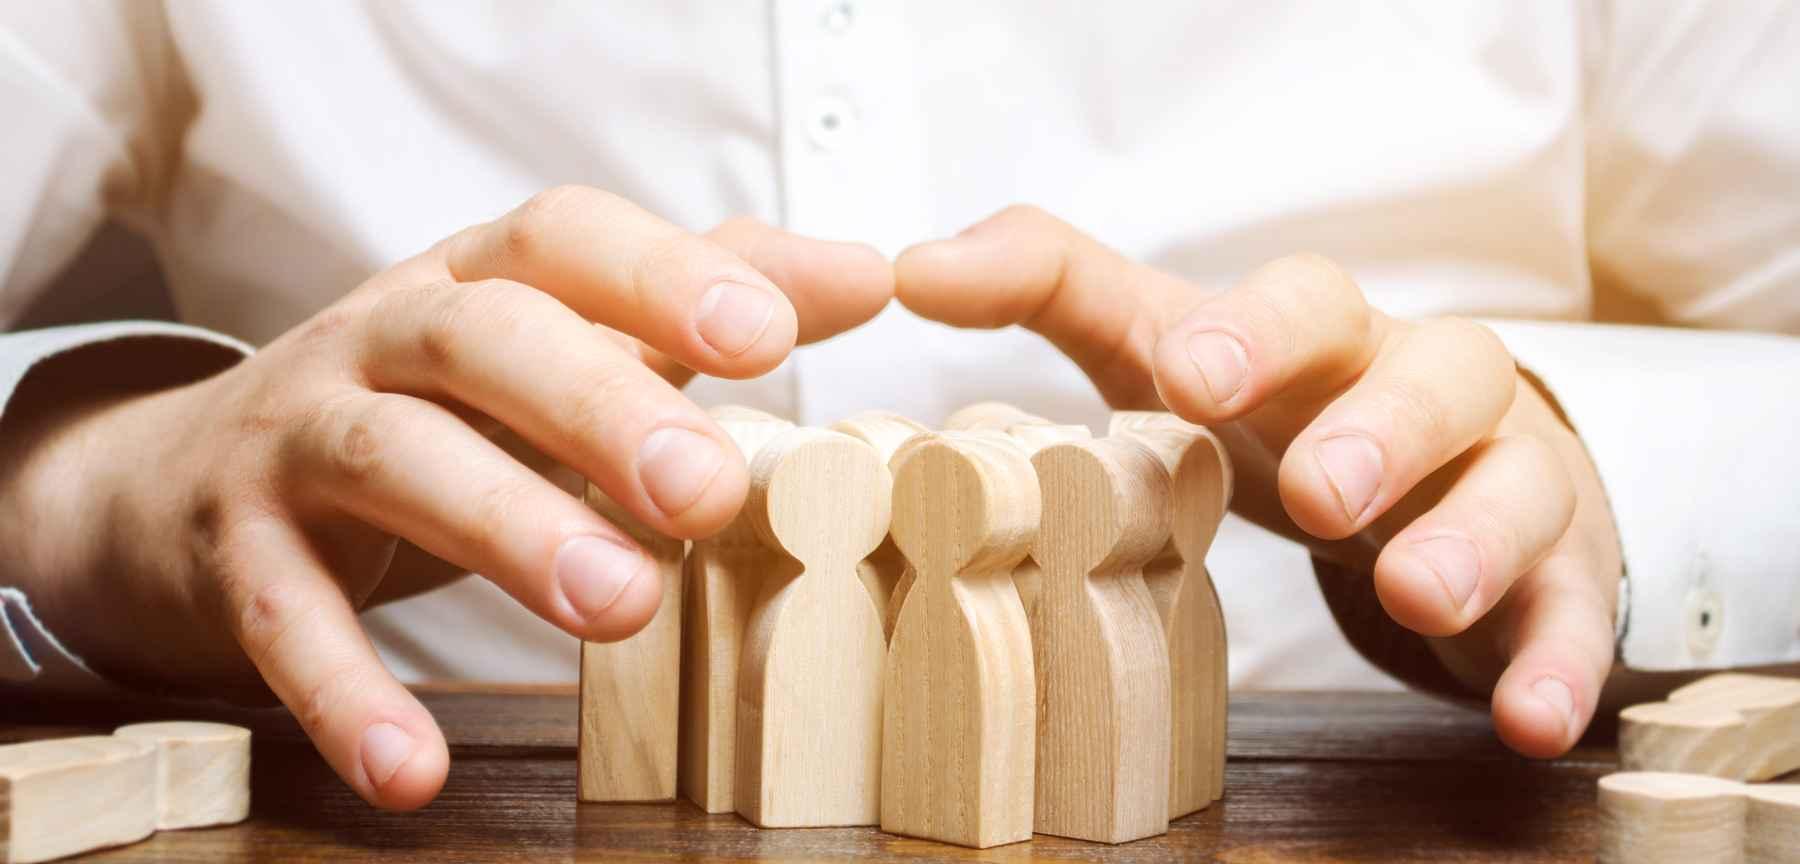 Digital Tools for Employee Retention